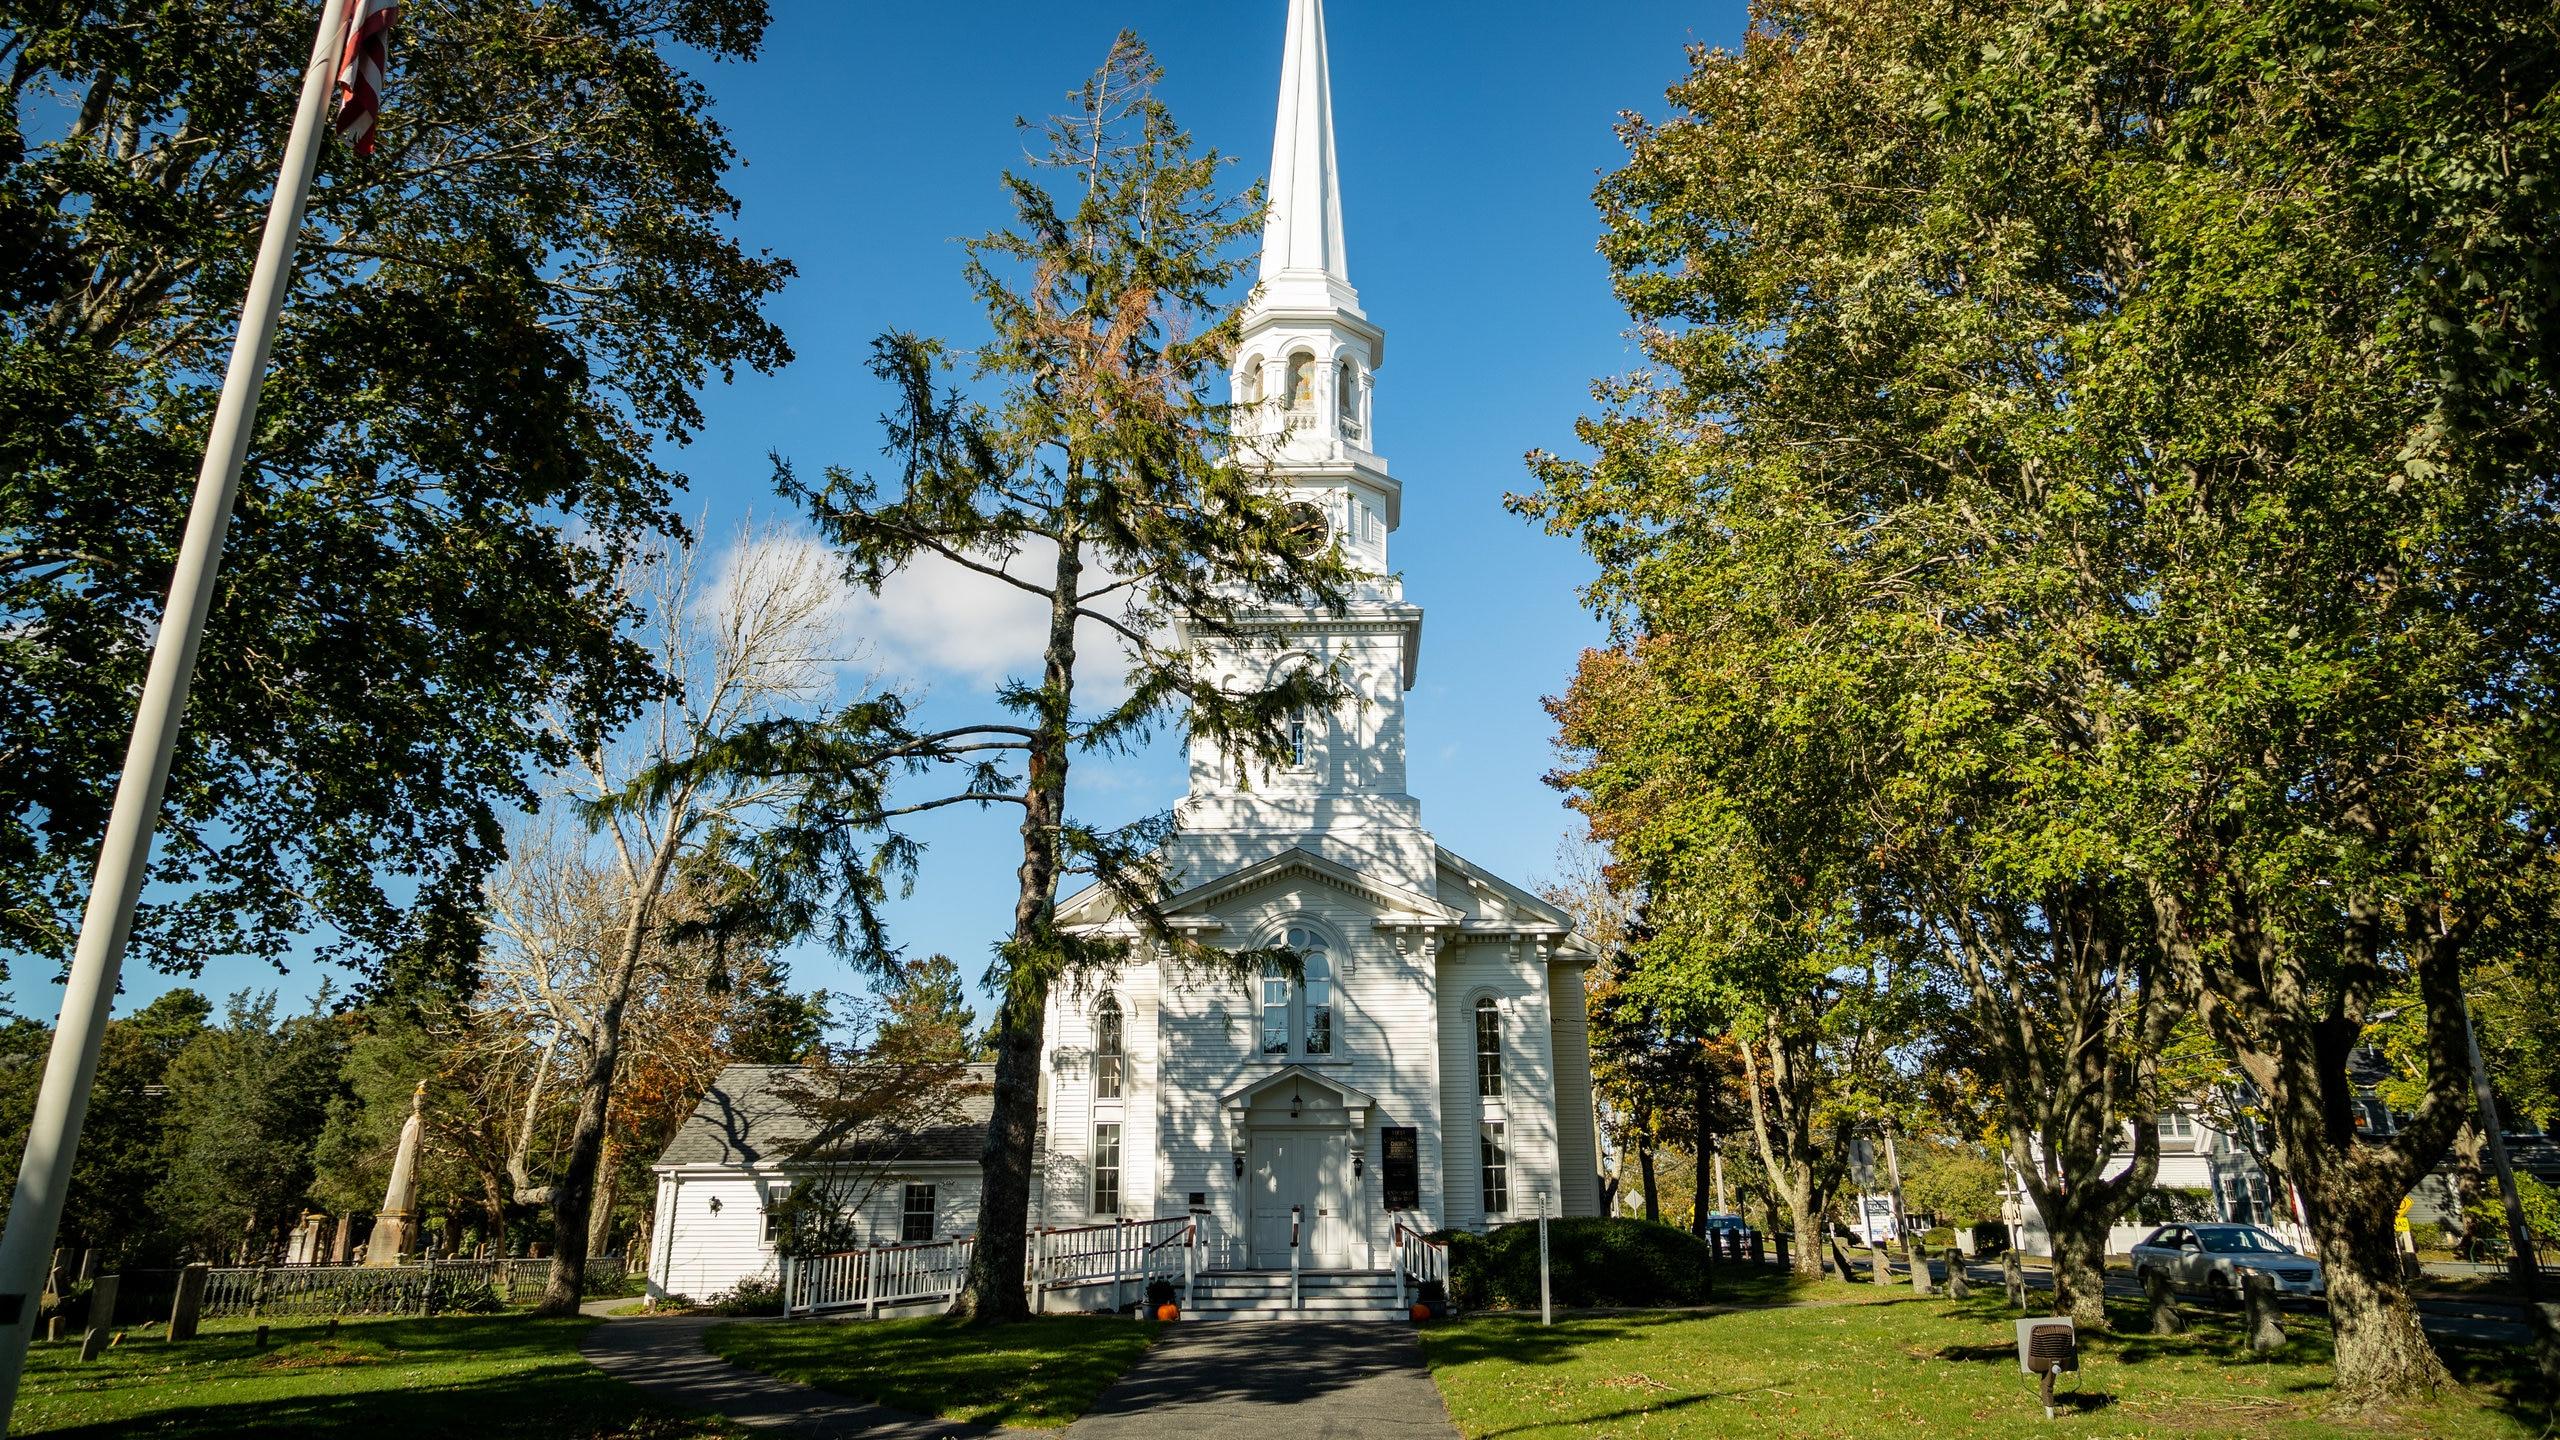 East Harwich, Massachusetts, United States of America